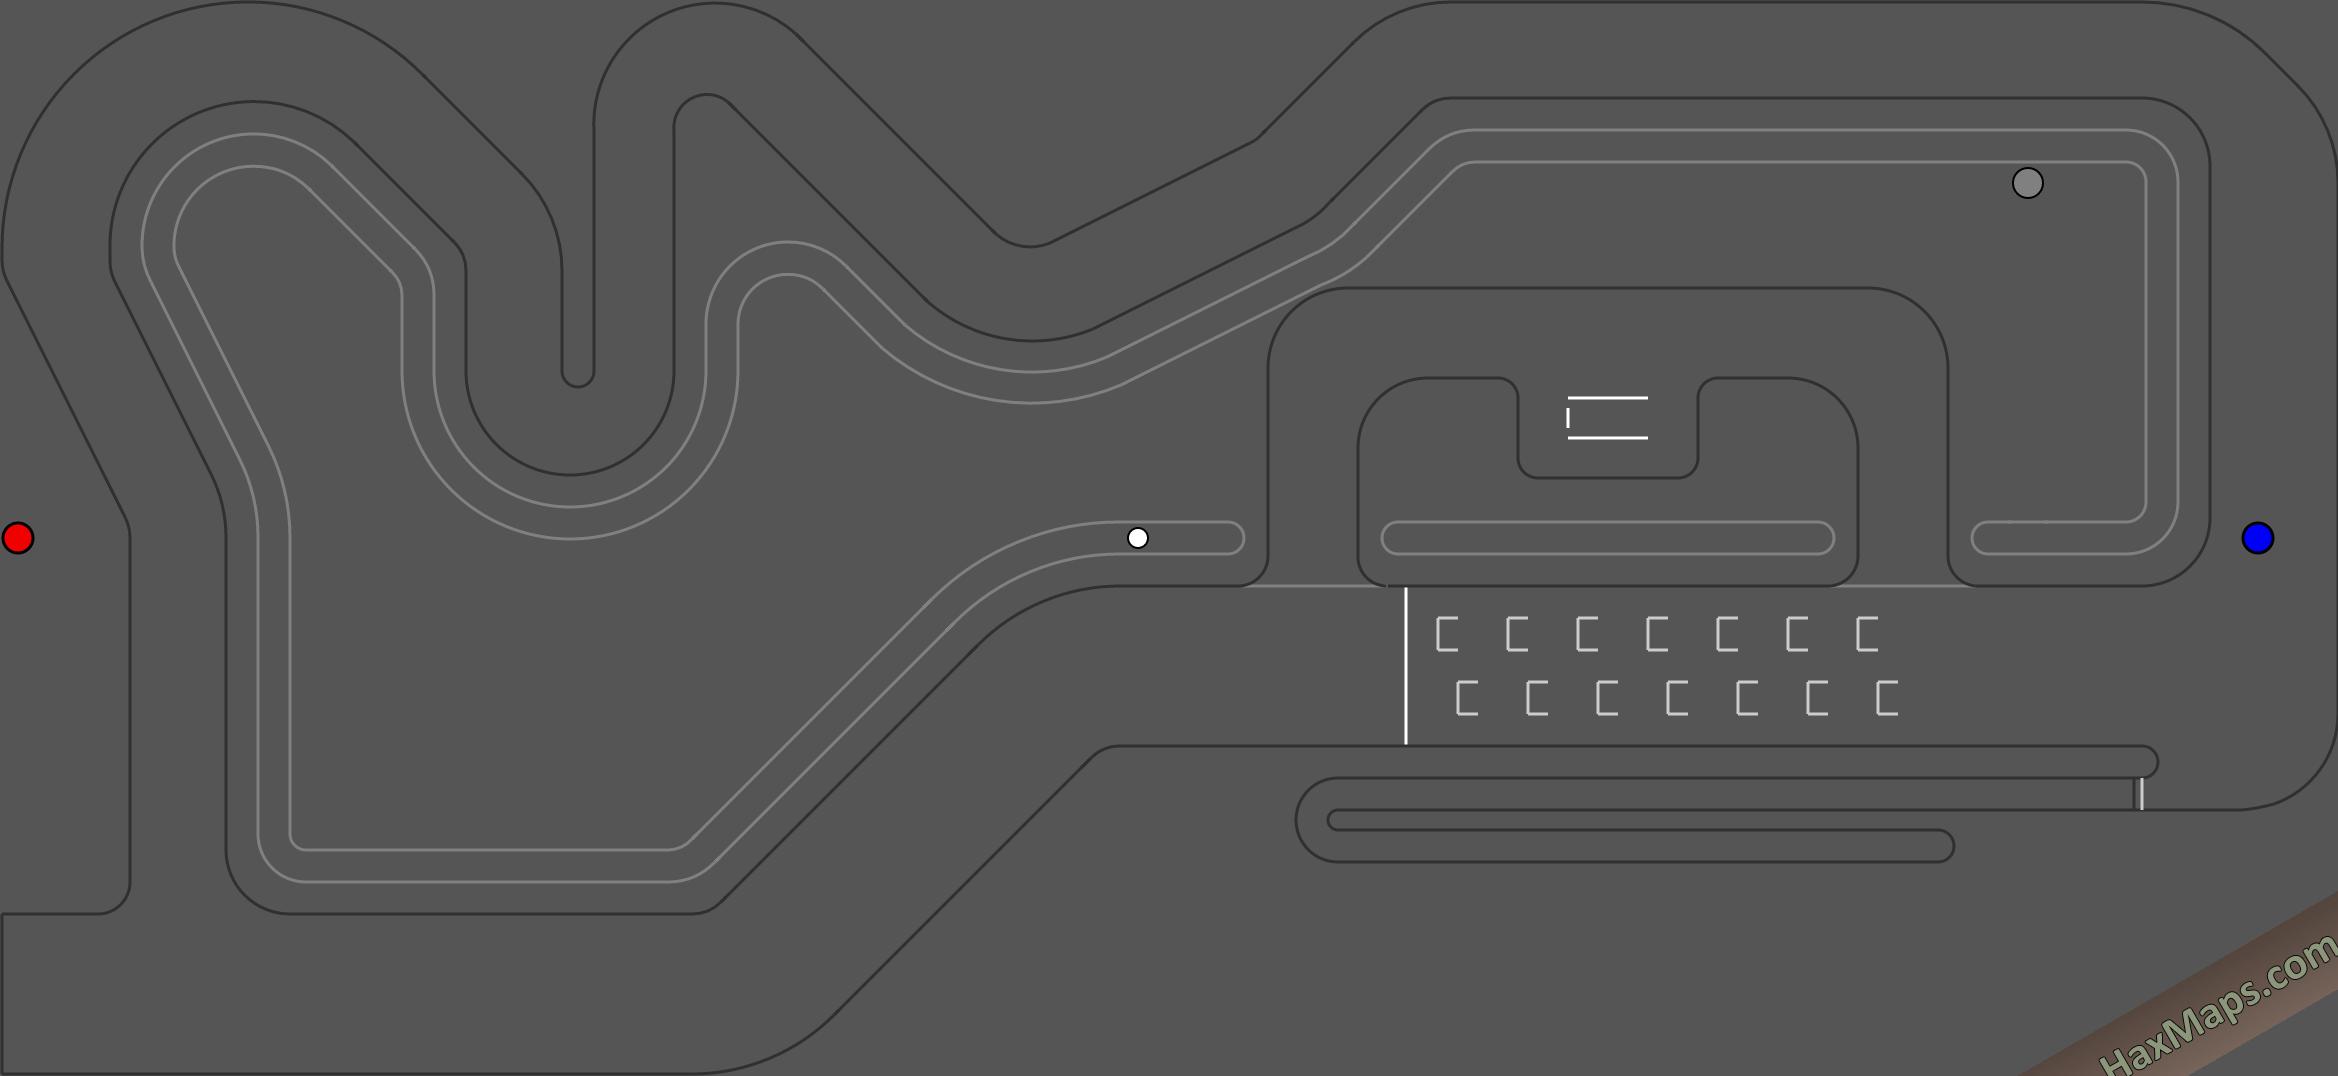 hax ball maps   Car Racing +4[PS]